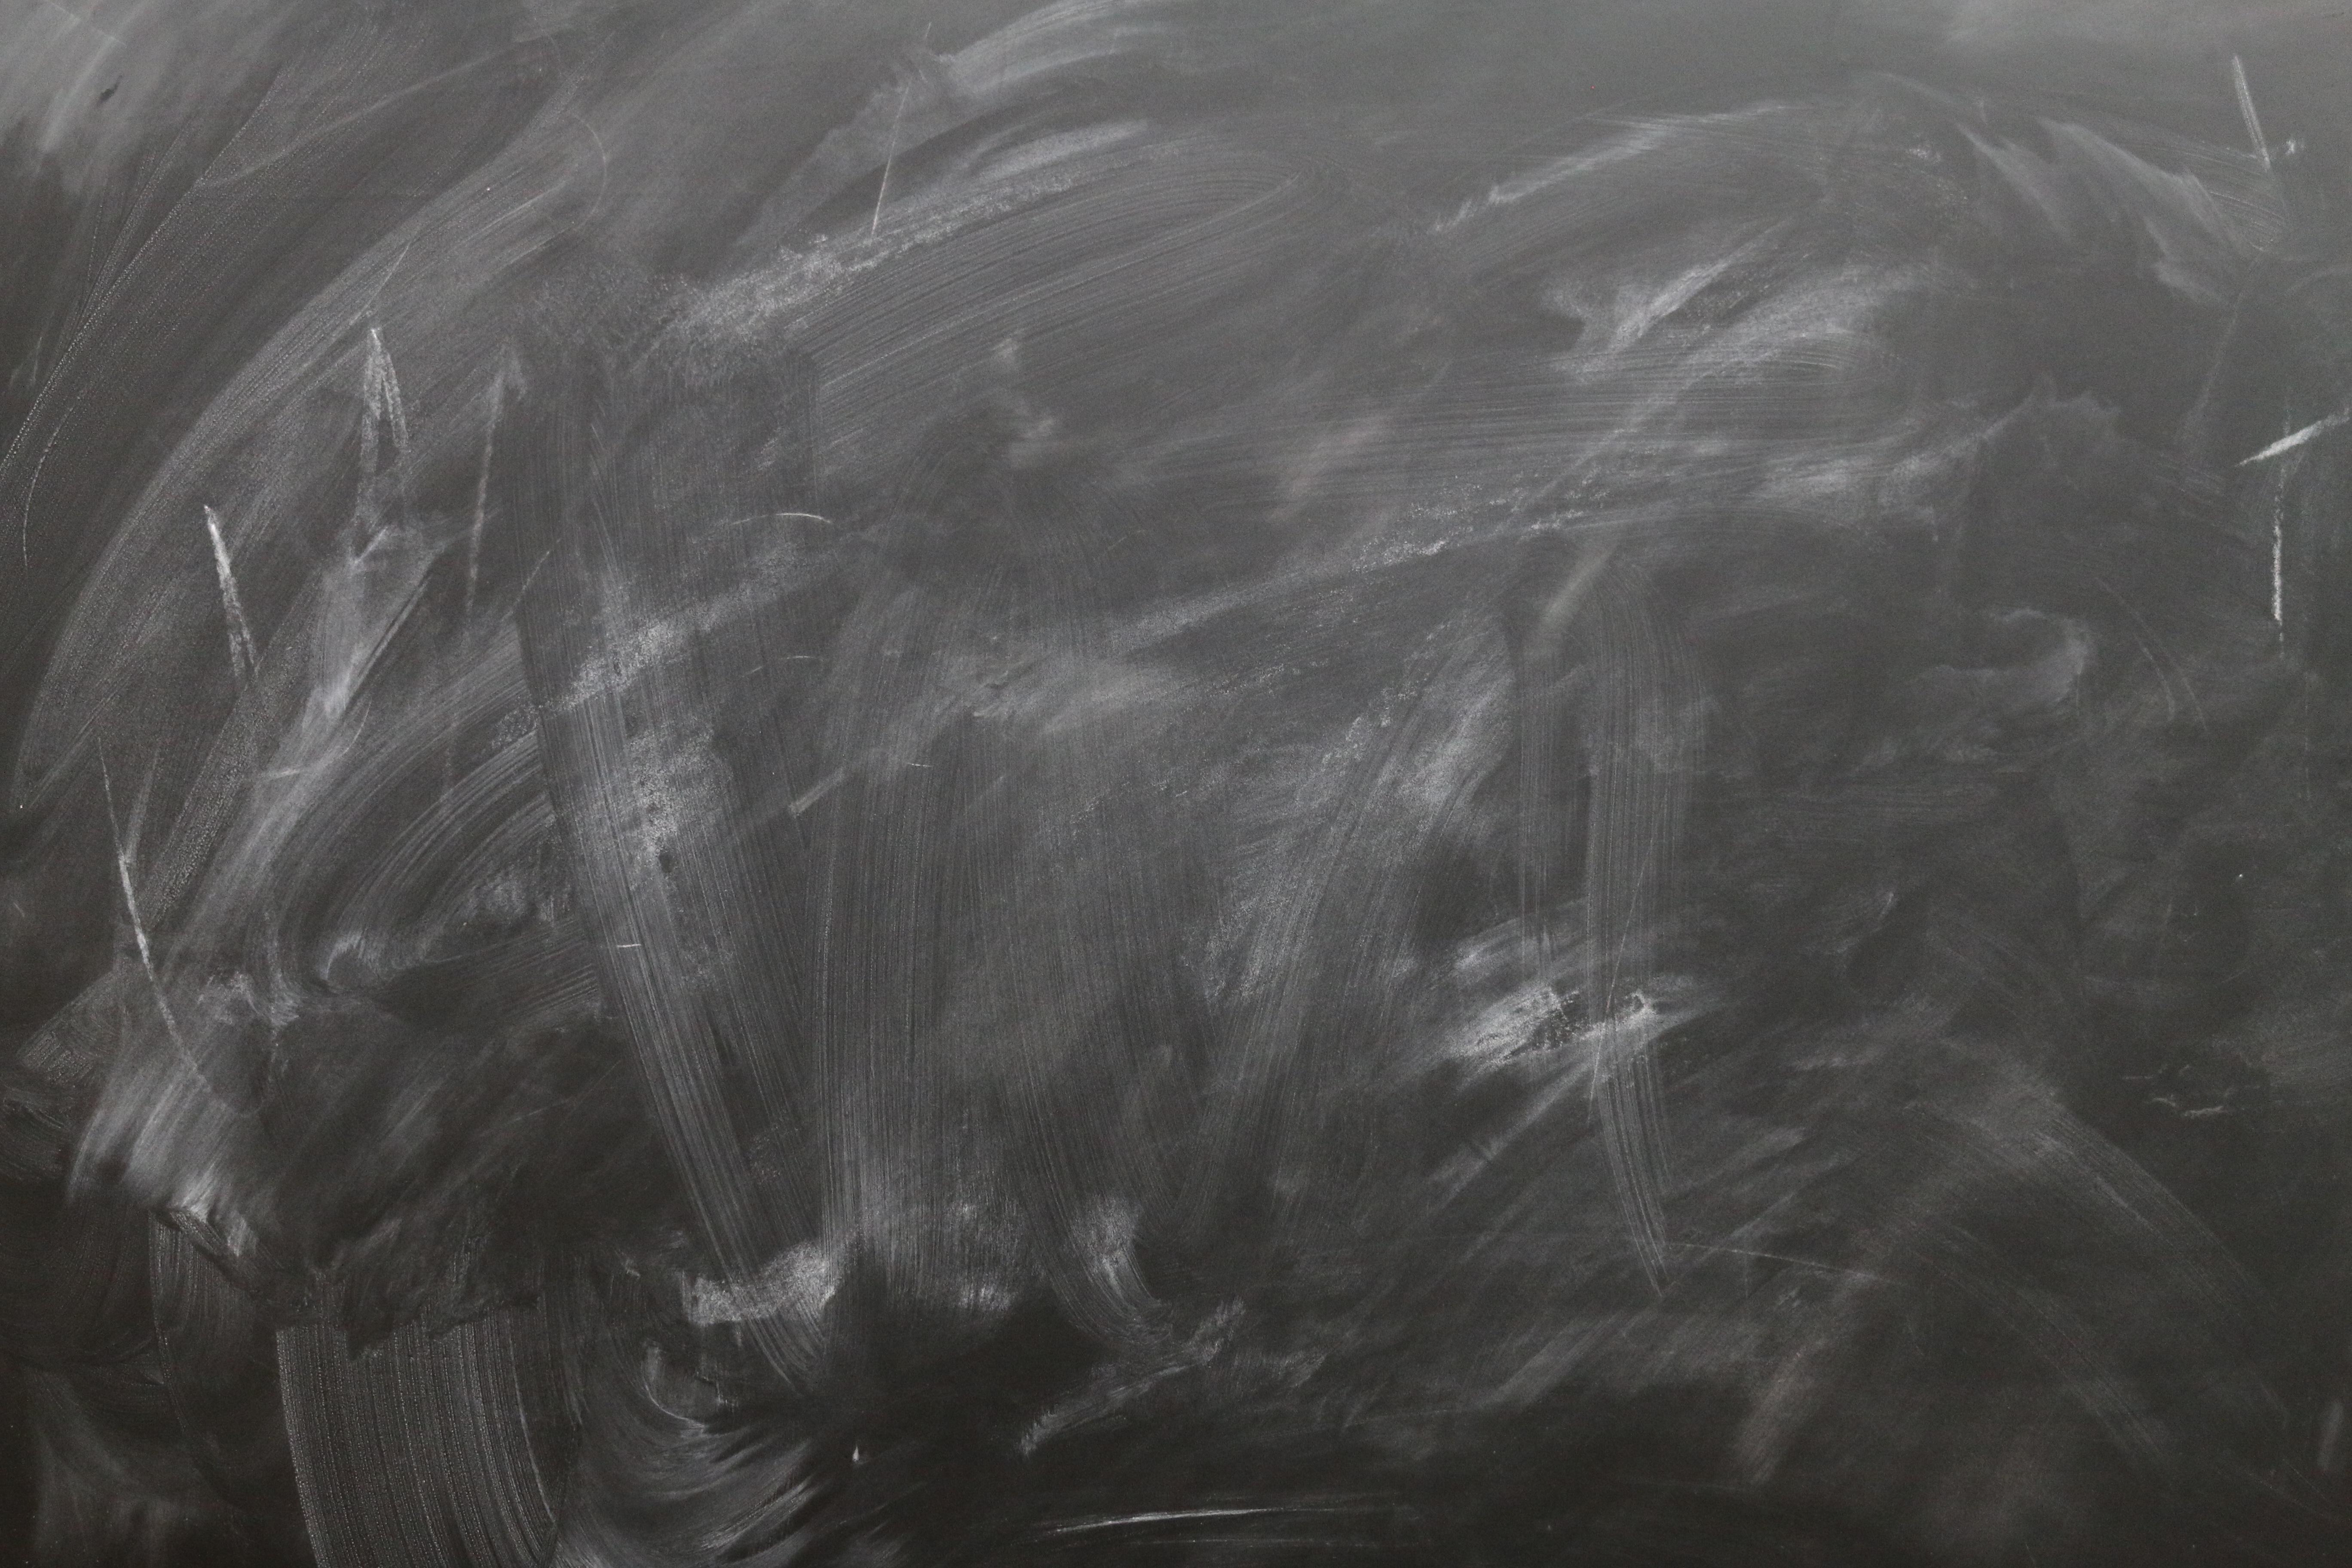 free images board texture old blackboard weather. Black Bedroom Furniture Sets. Home Design Ideas